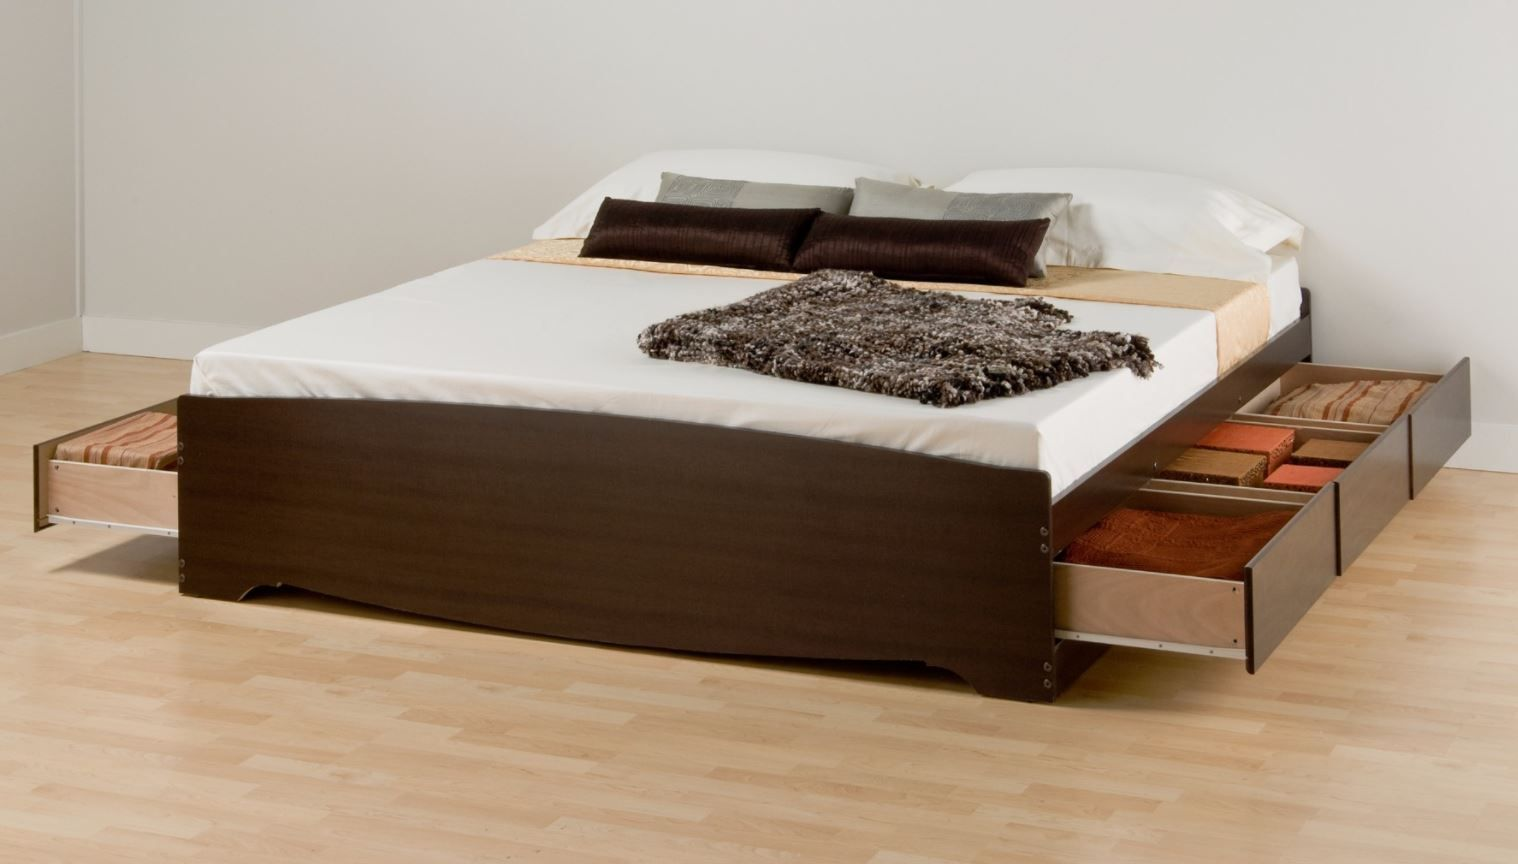 Espresso King Mate S Platform Storage Bed W 6 Drawers Prepac Ebk 8400 K Enjoy Floor E And With The